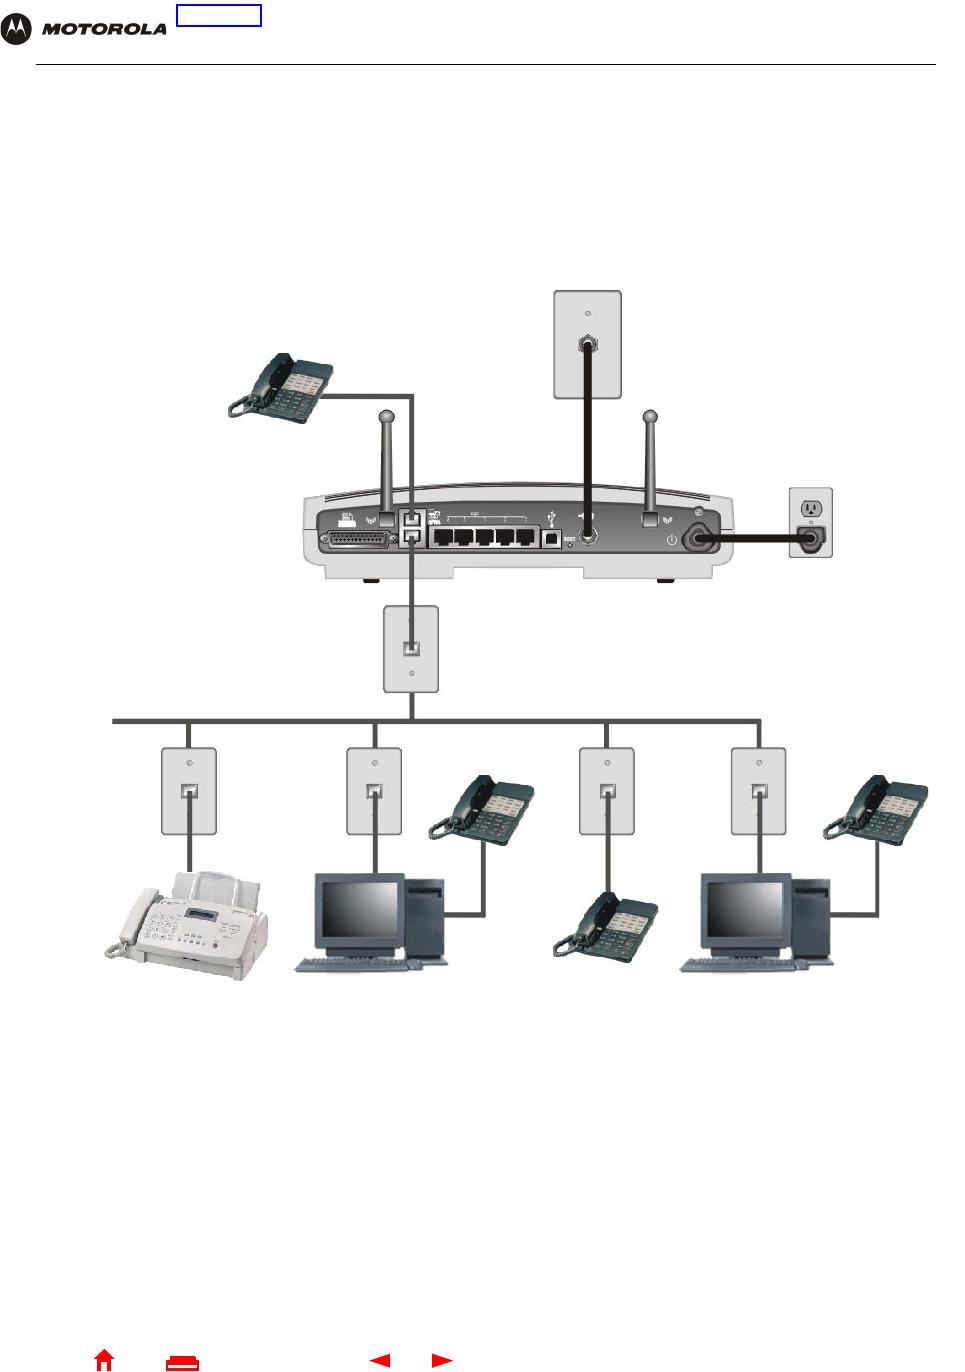 ARRIS SBG1000-1 Cable Modem Gateway User Manual Master